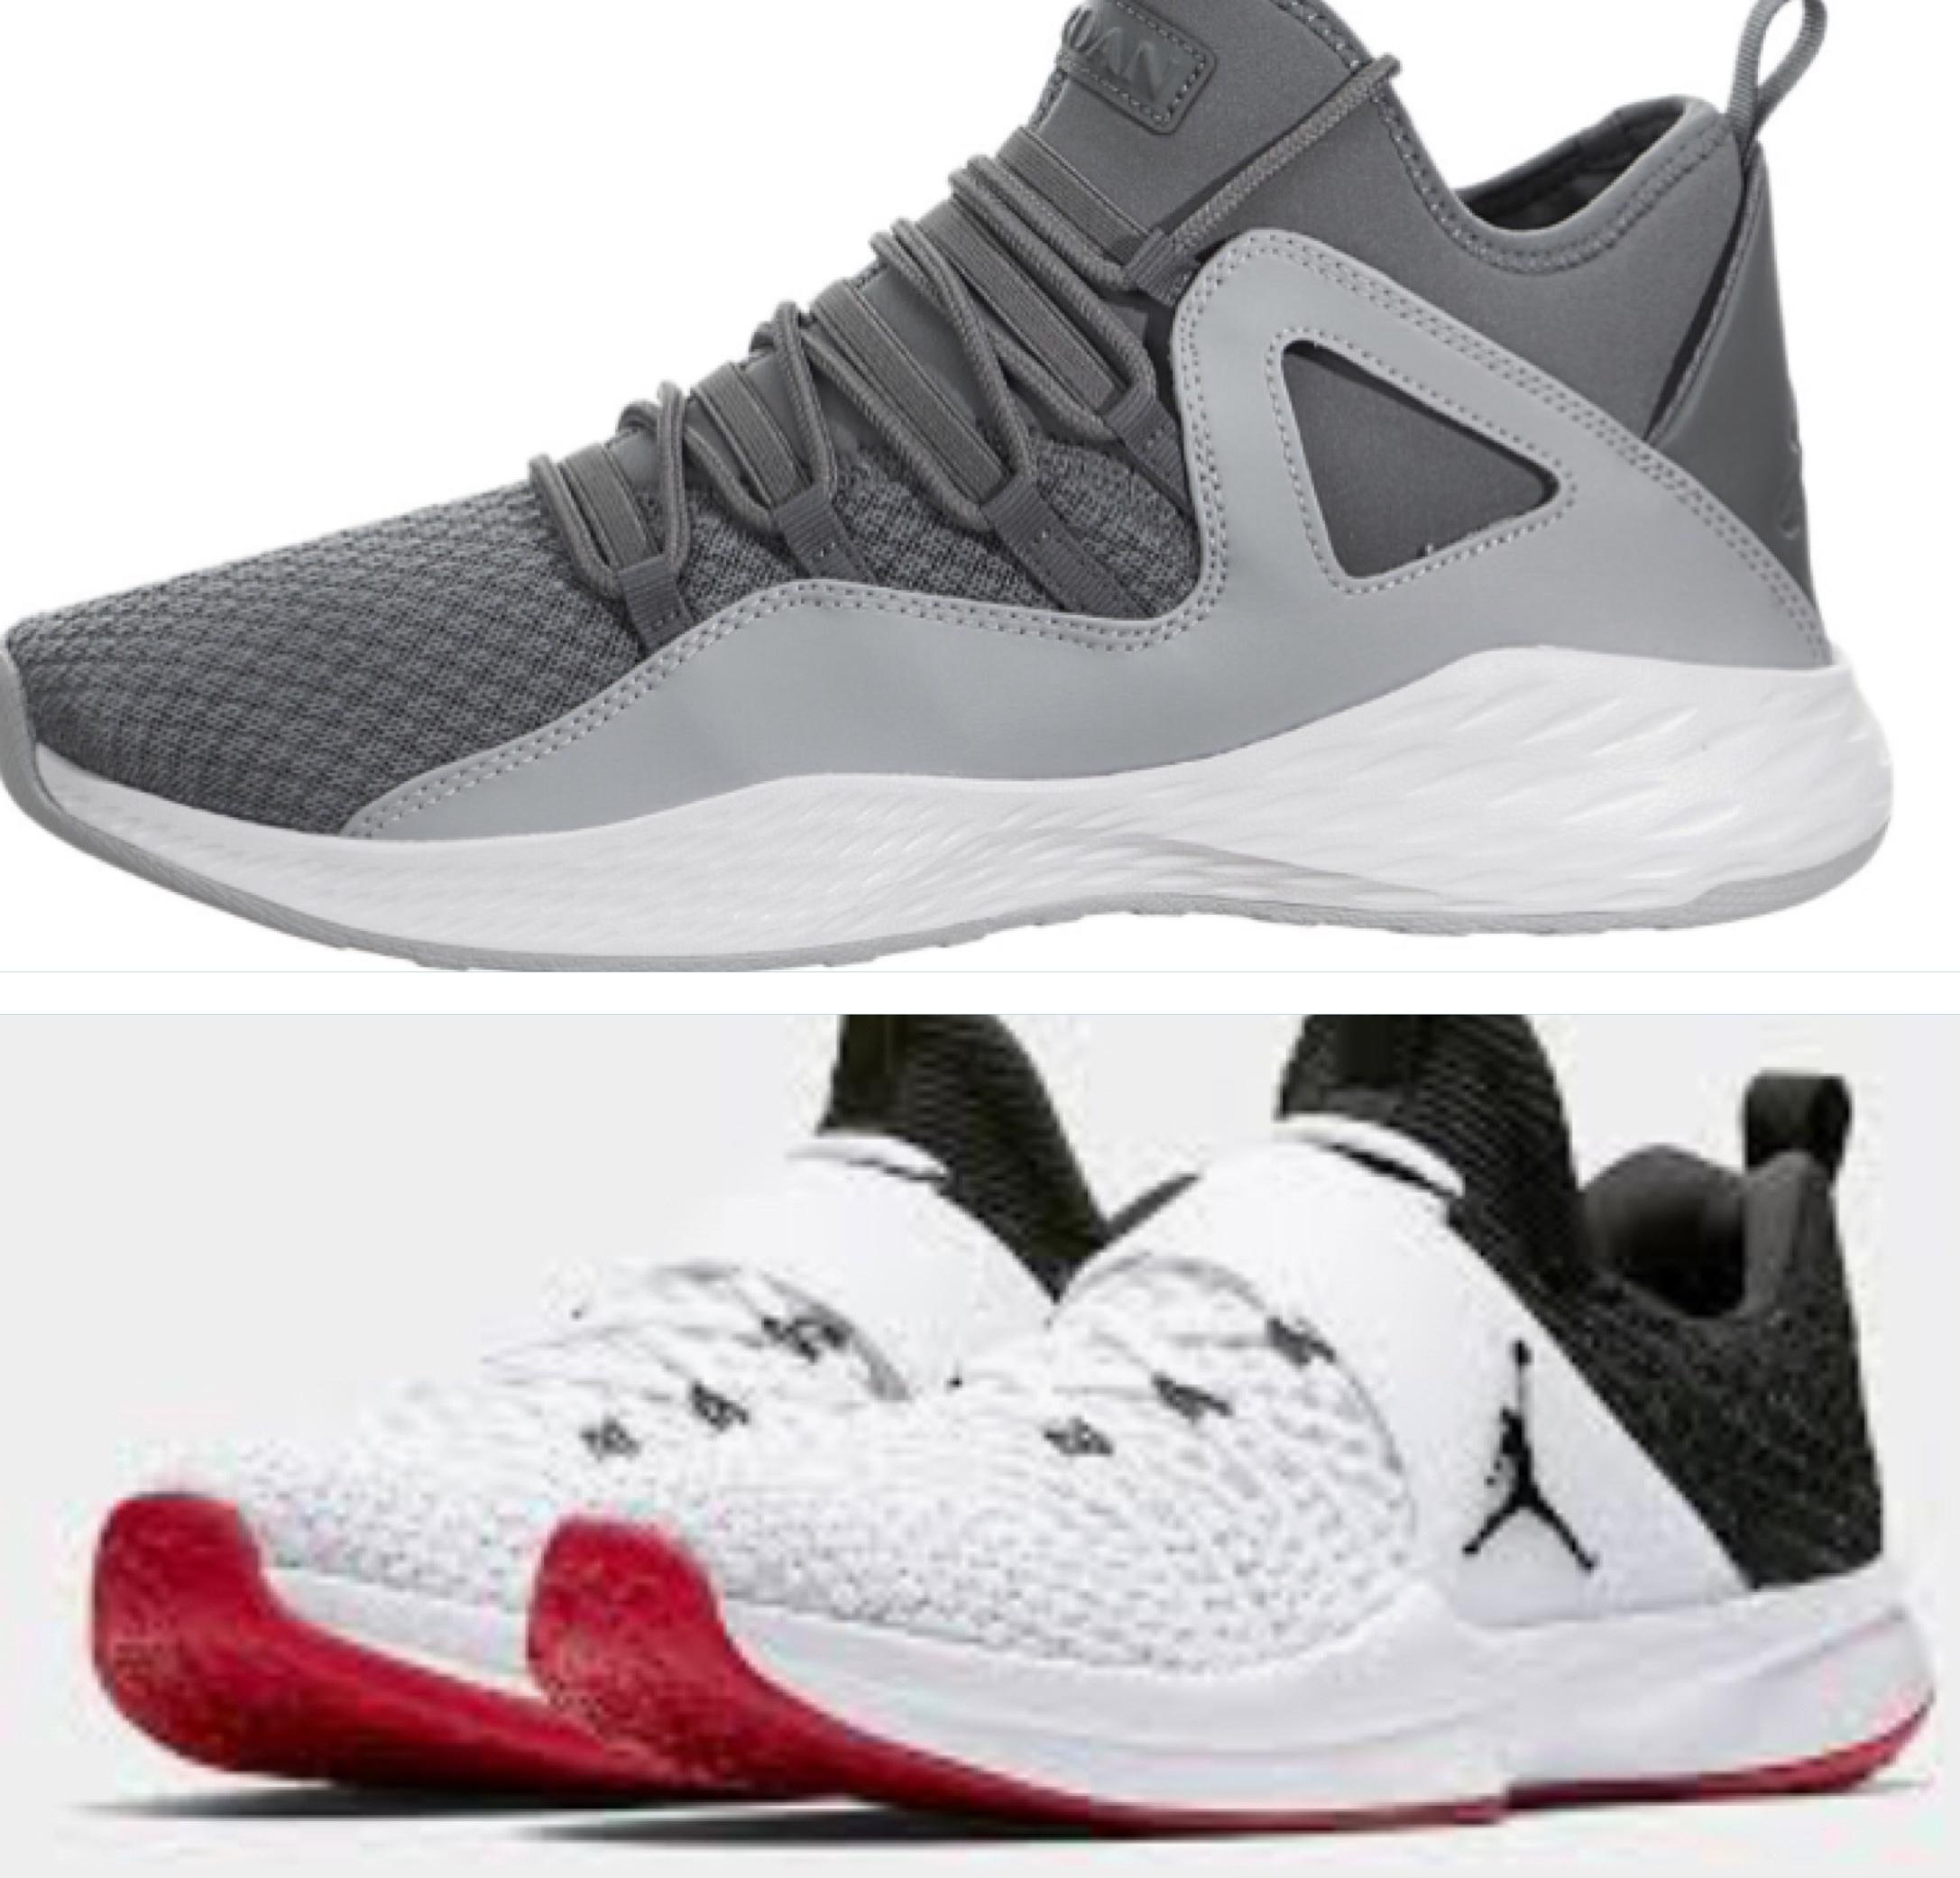 ba84a7080201 Adult Nike Jordan 23 Lows   Jordan trainers 2 Flyknit only £30 Nike  Clearance Castleford